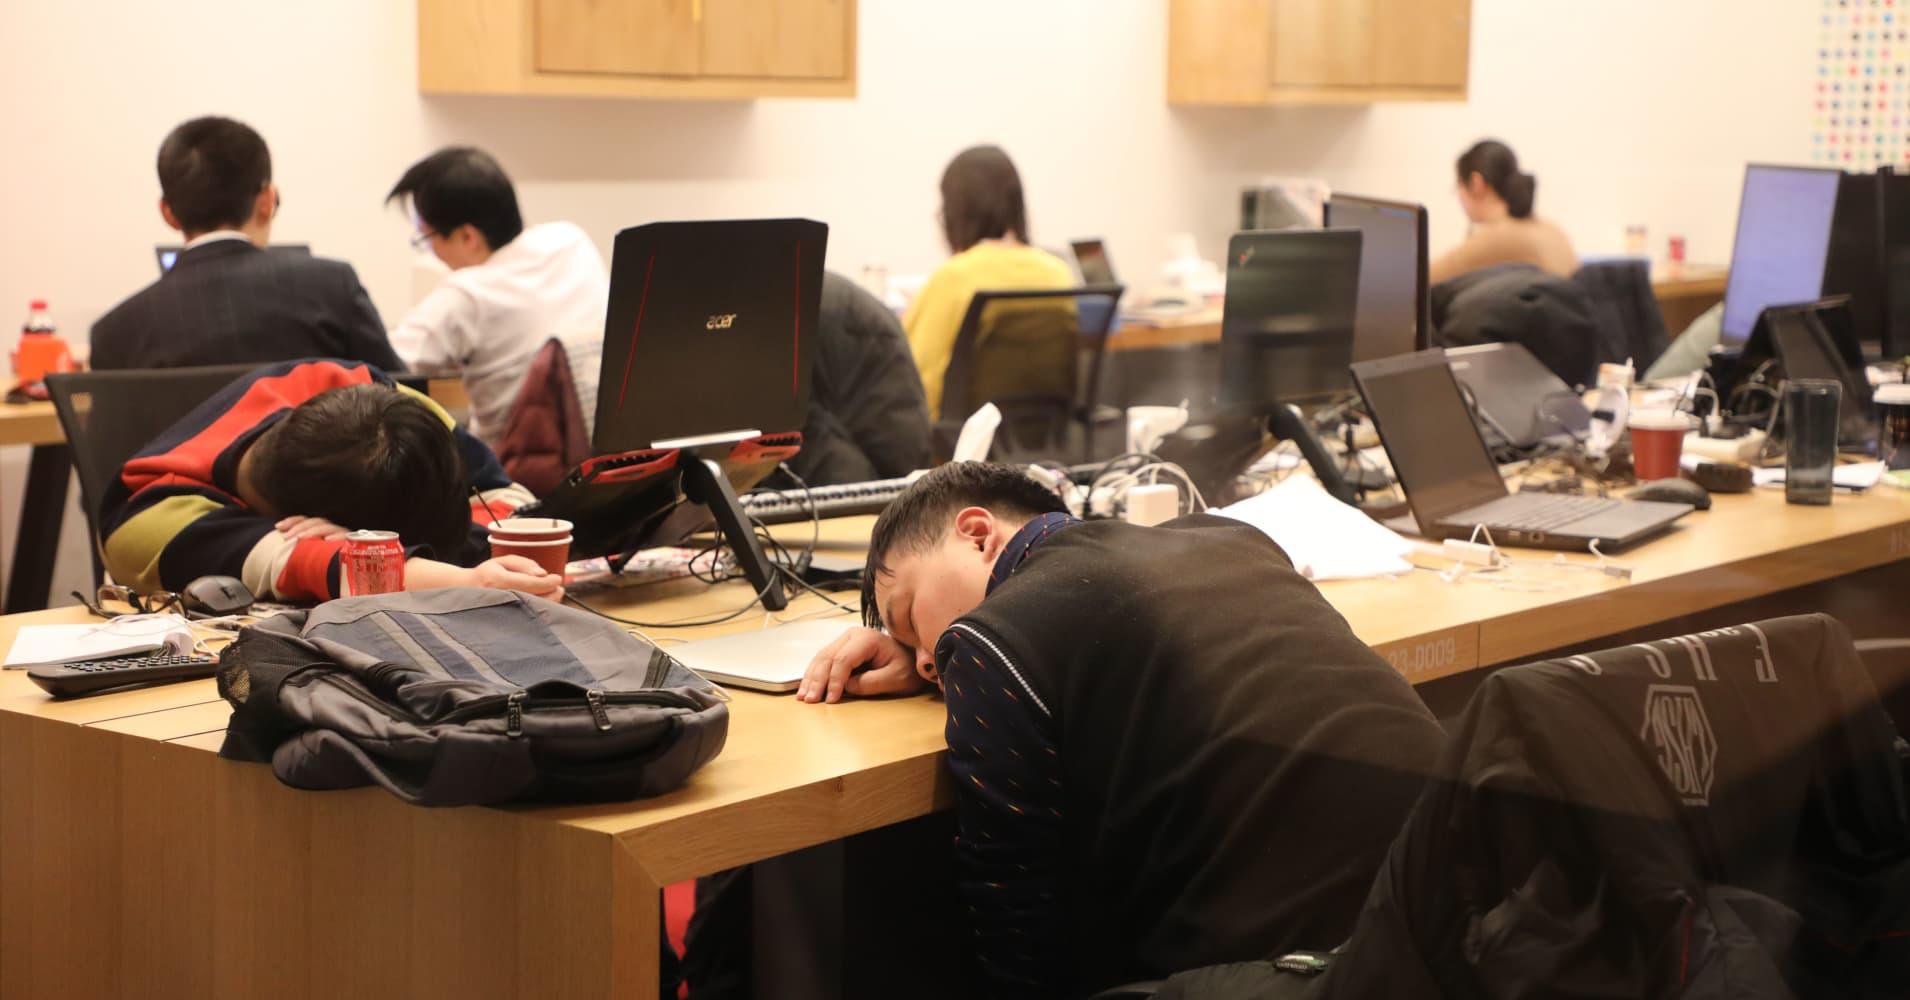 People sleep on desks at a start-up incubator in Beijing on January 9, 2018.